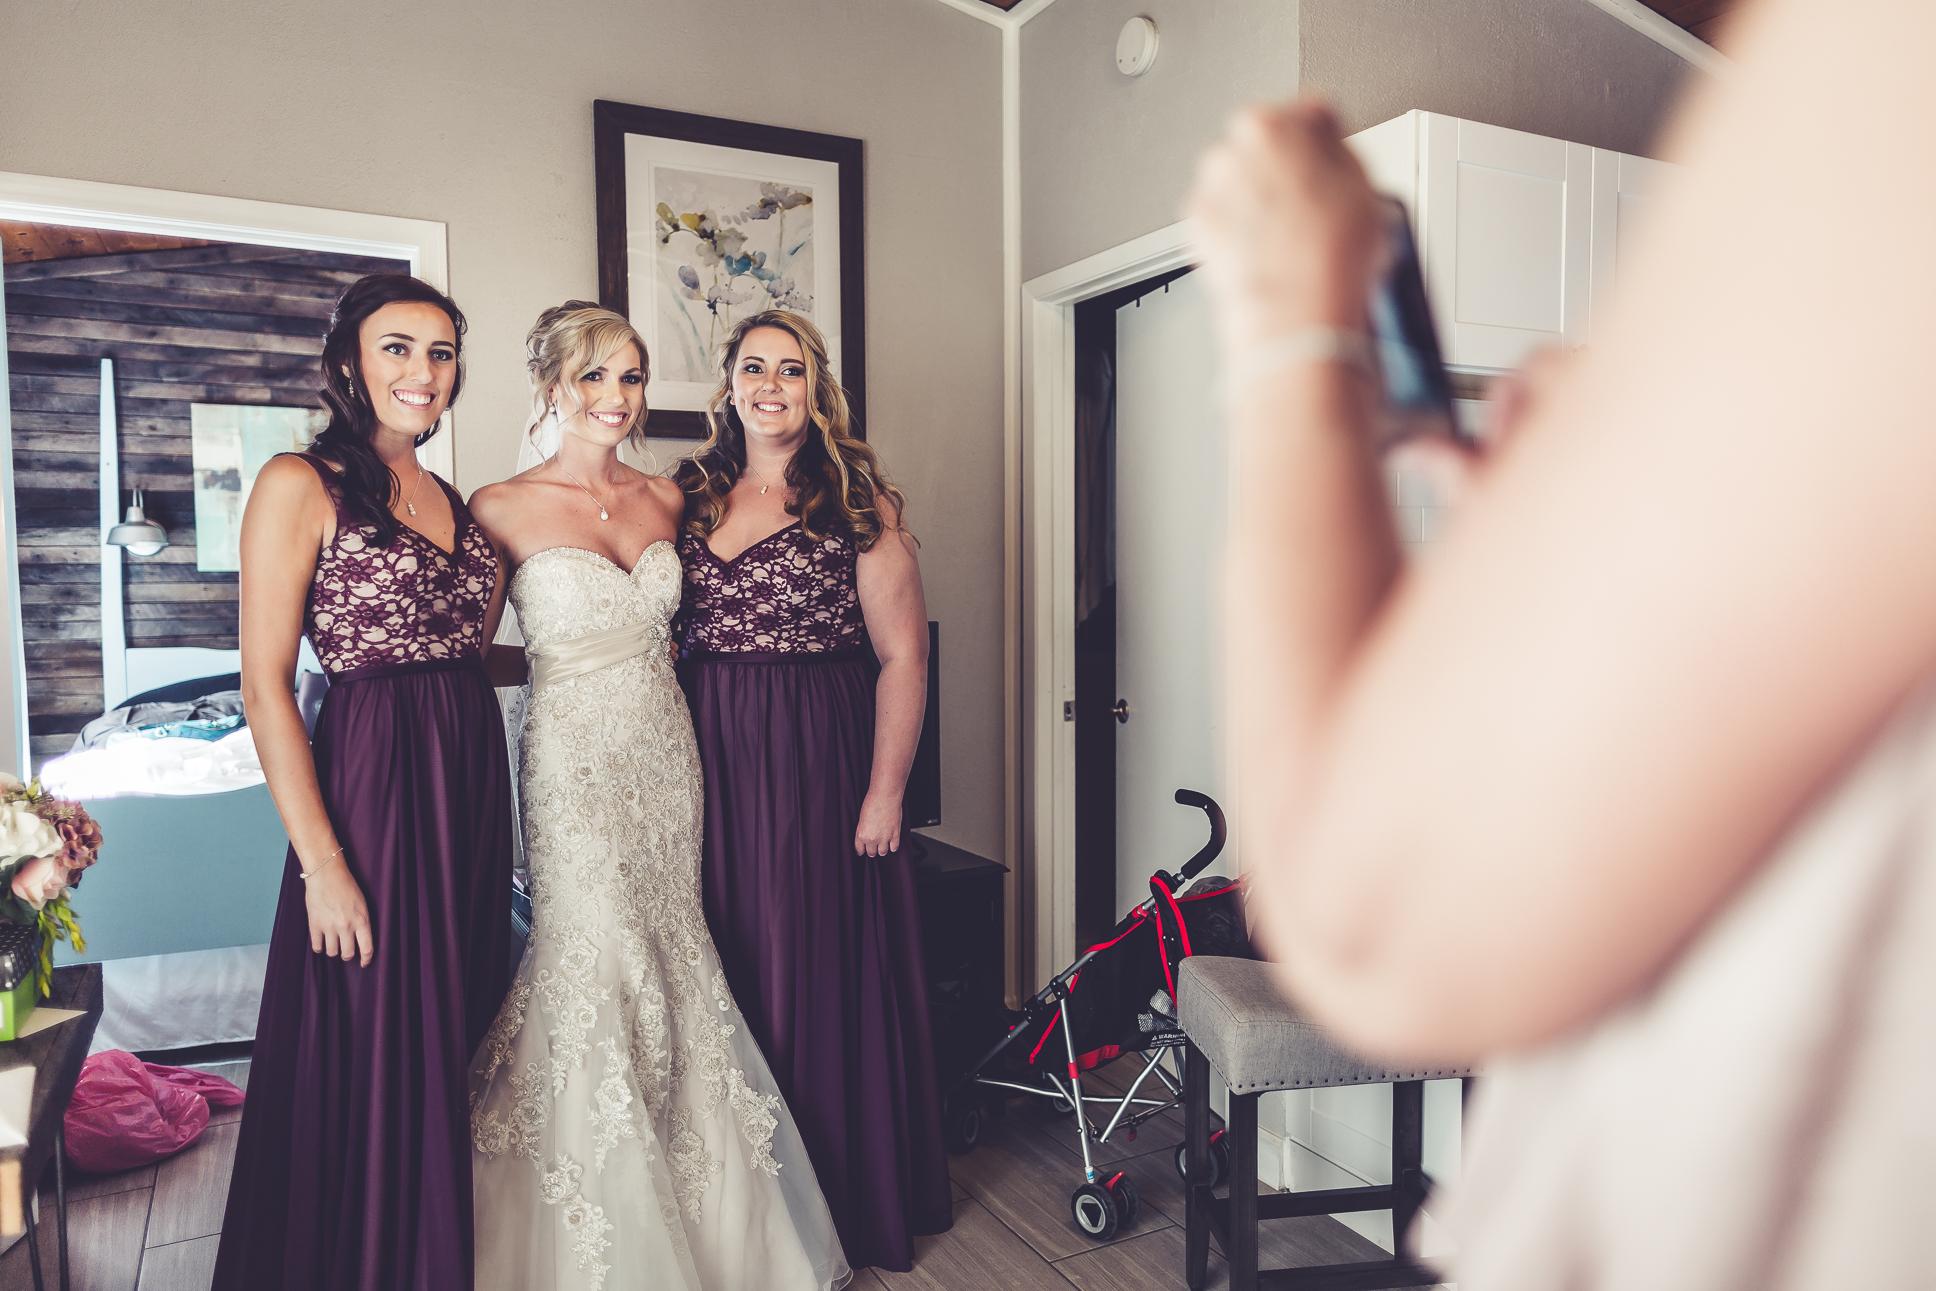 Southern Illinois Wedding Photography - Dustin Morrison Photography - Byrne Wedding-21.jpg